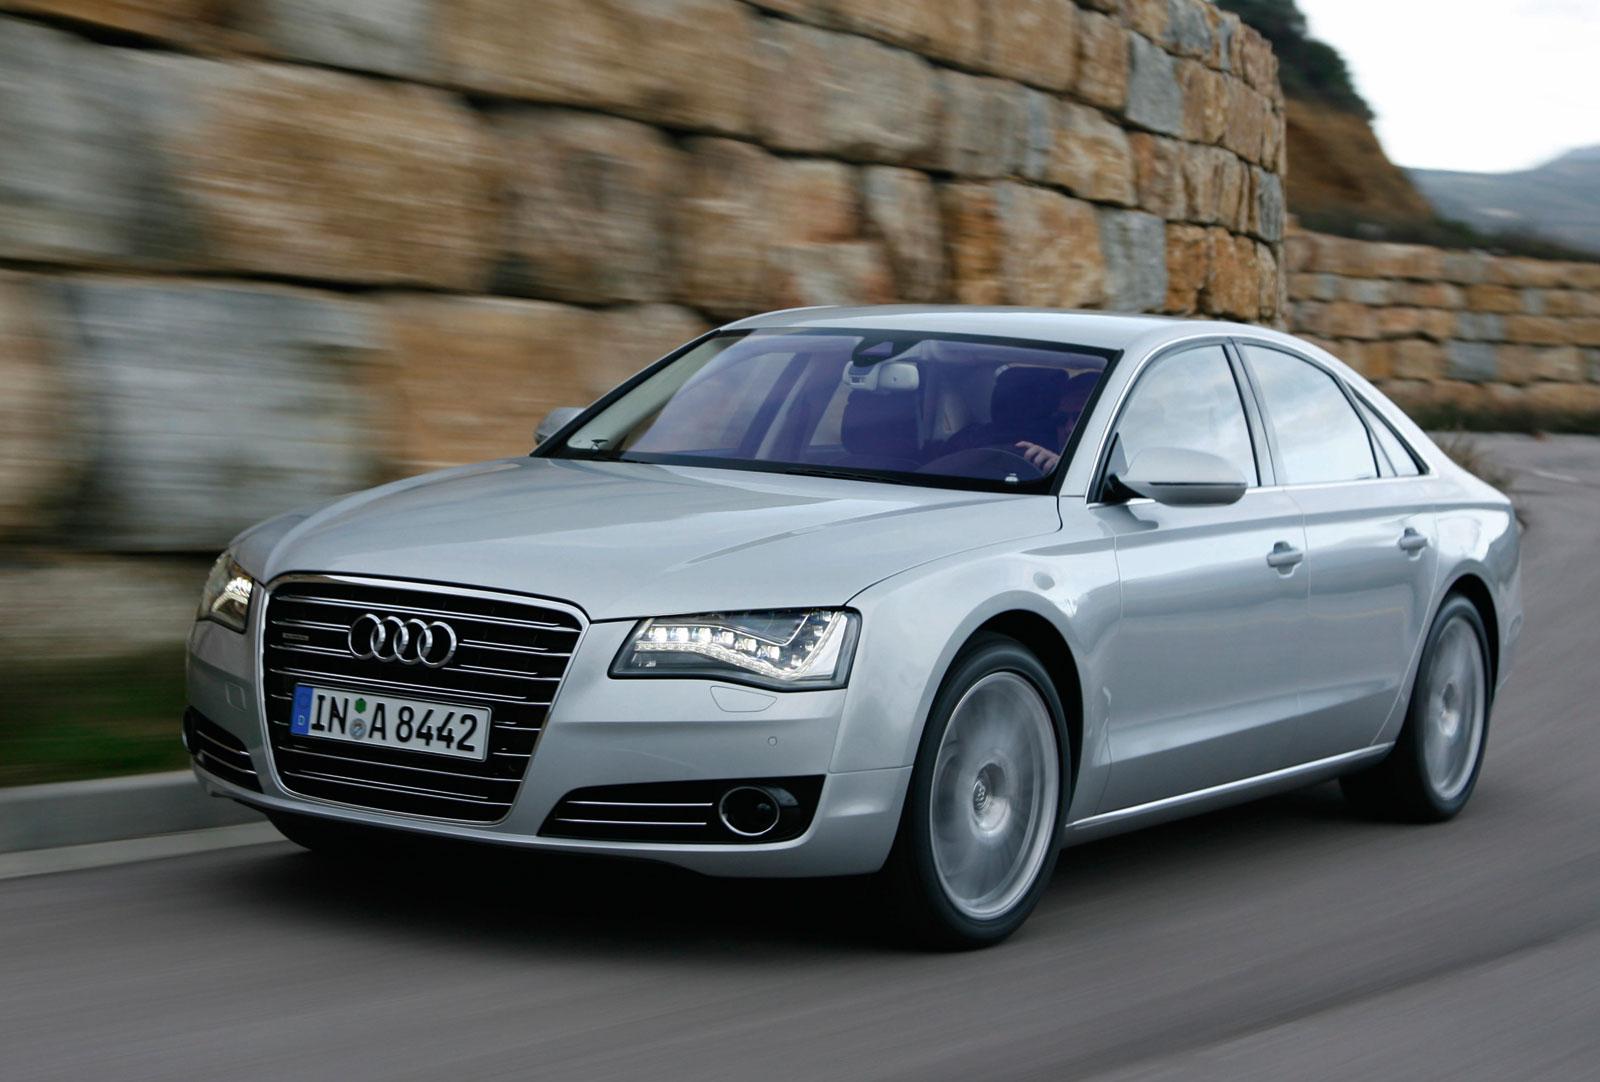 http://4.bp.blogspot.com/-xFyc-tkXVAg/T-Ce-6X4RAI/AAAAAAAADoA/qcz4izYZPn8/s1600/Audi+A8+hd+Wallpapers+2011_4.jpg